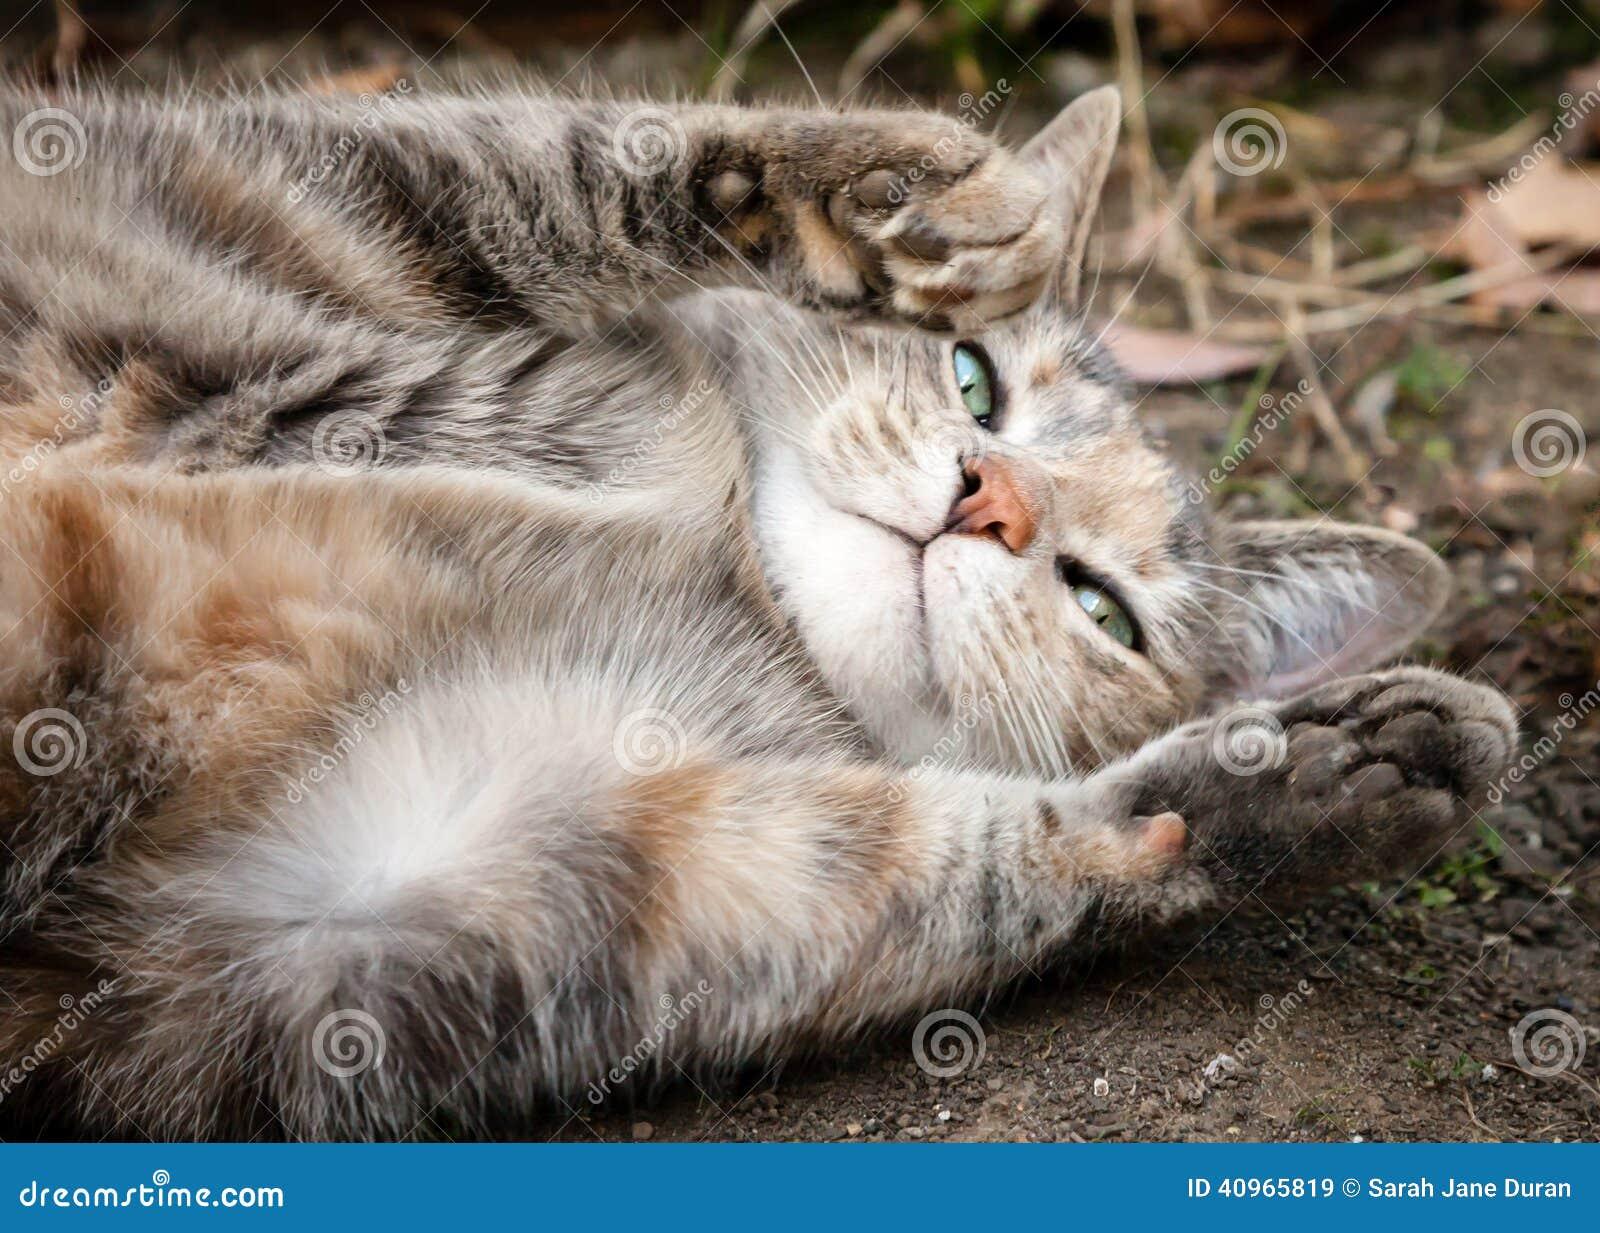 Tortoiseshell Tabby Cat Rolling On Dirt, Asking For Belly ... Tabby Cat Sitting Up